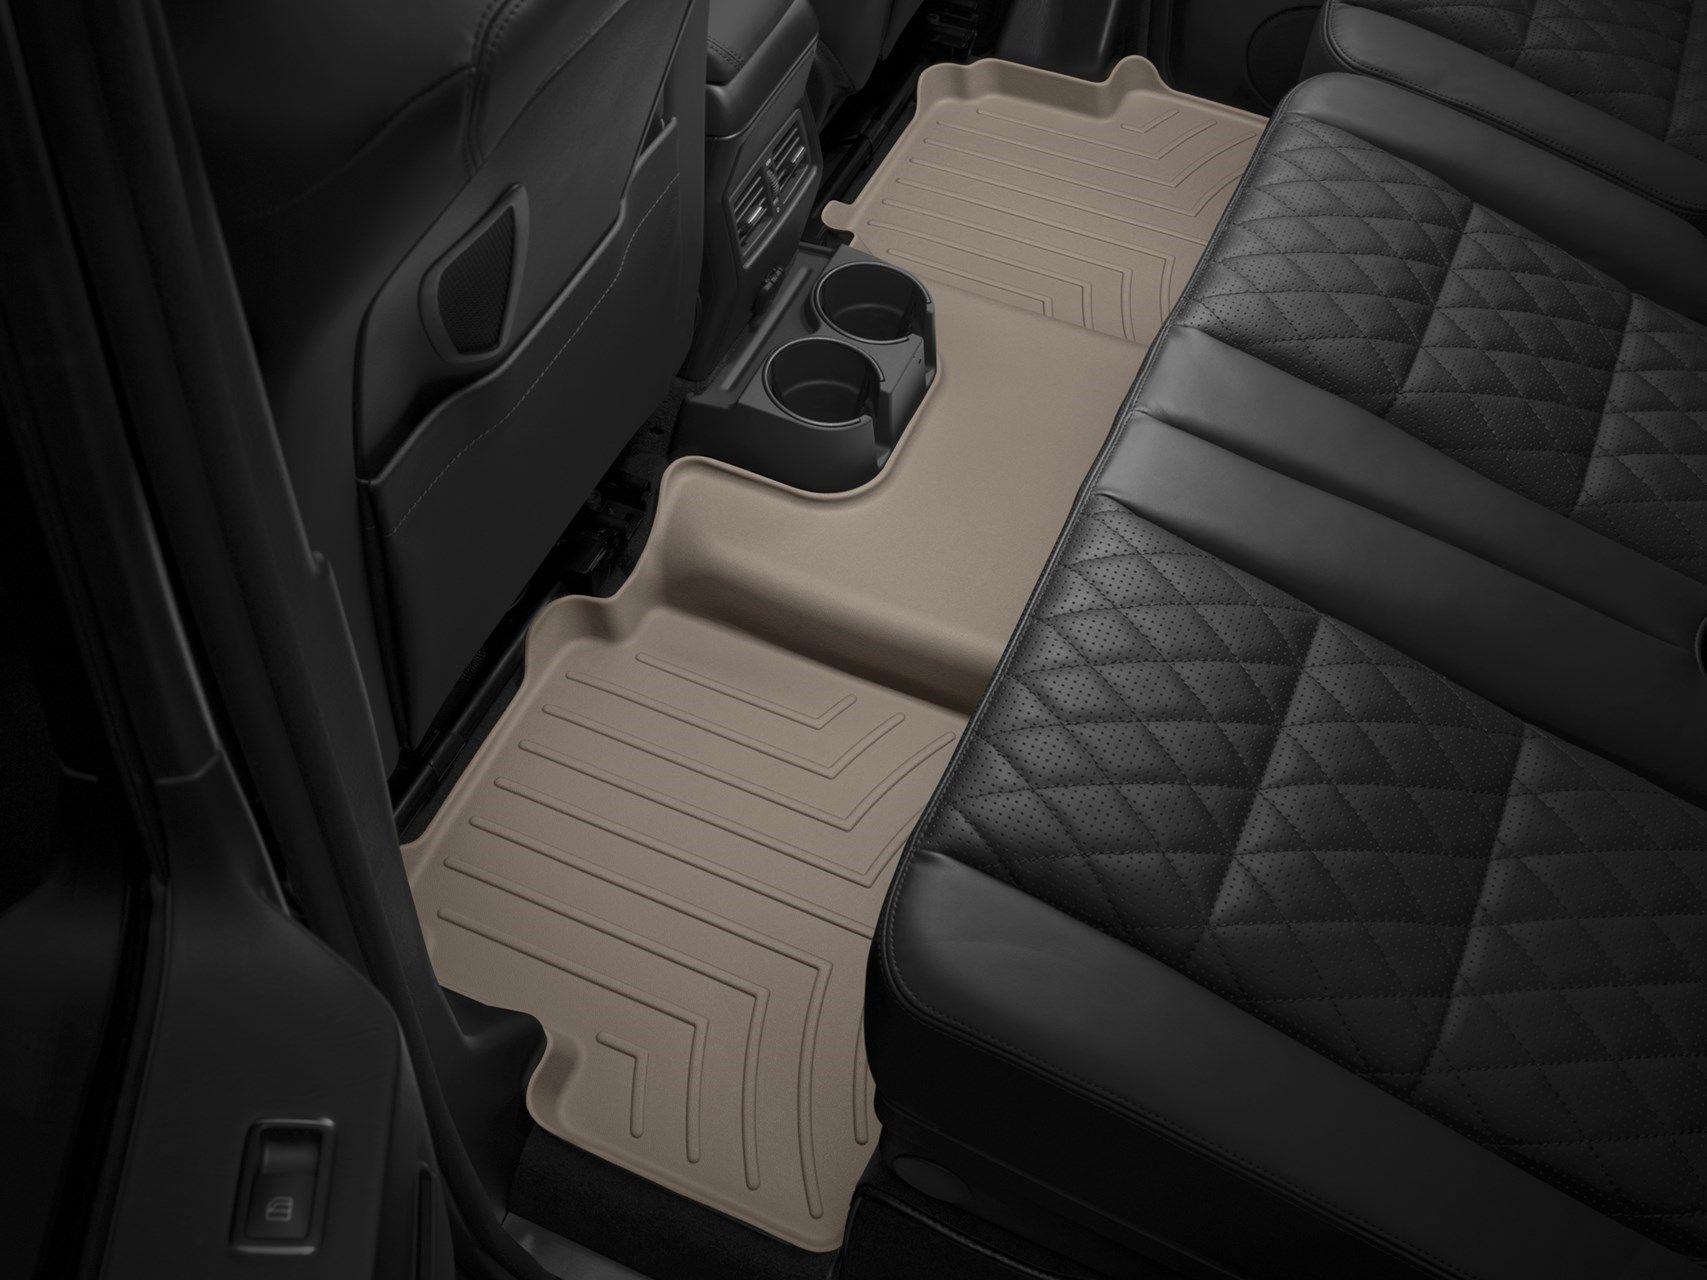 2018 Subaru Crosstrek Floor Mats Laser Measured Floor Mats For A Perfect Fit Weathertech Weather Tech Subaru Subaru Impreza